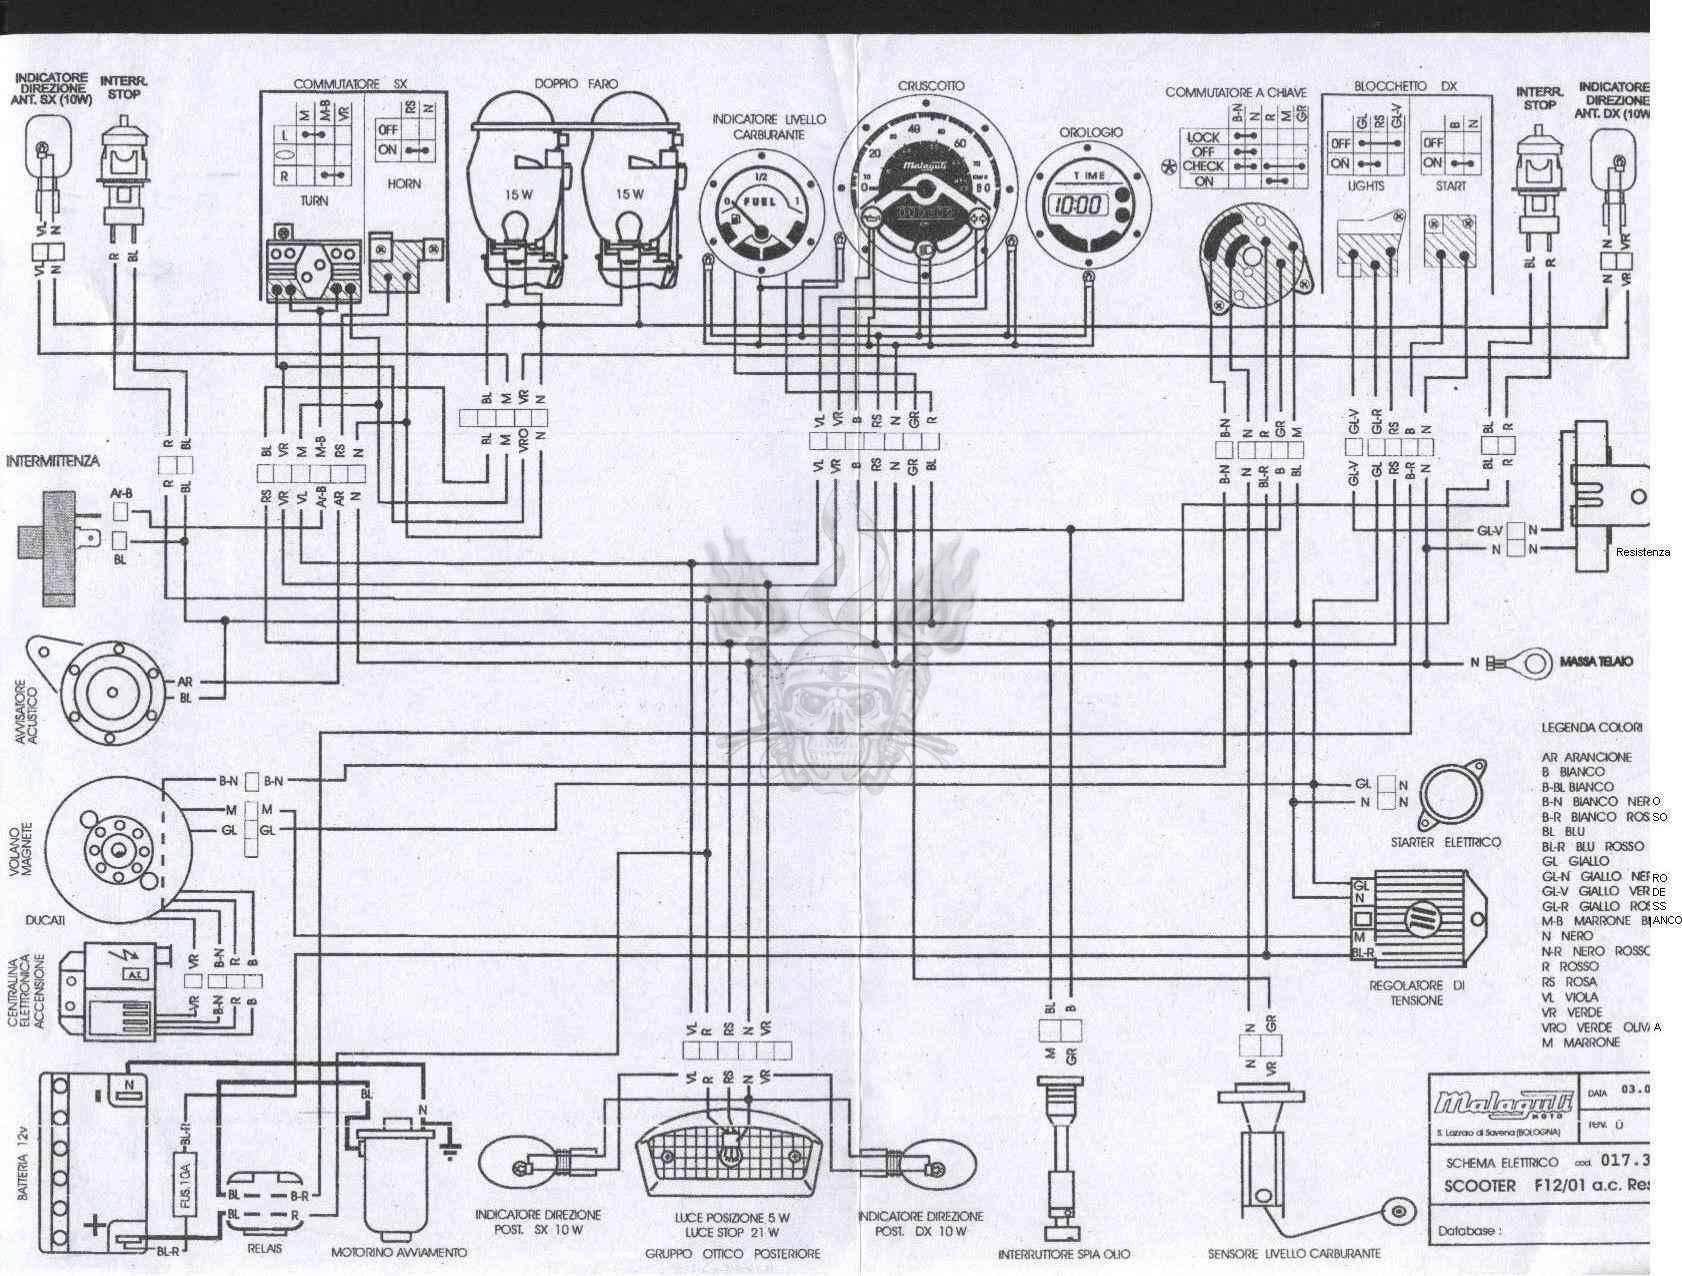 [DIAGRAM_5NL]  Jd 2520 Wiring Diagram - Engine Coolant Reservoir System Diagram for Wiring  Diagram Schematics | John Deere 2520 Wiring Diagram |  | Wiring Diagram Schematics